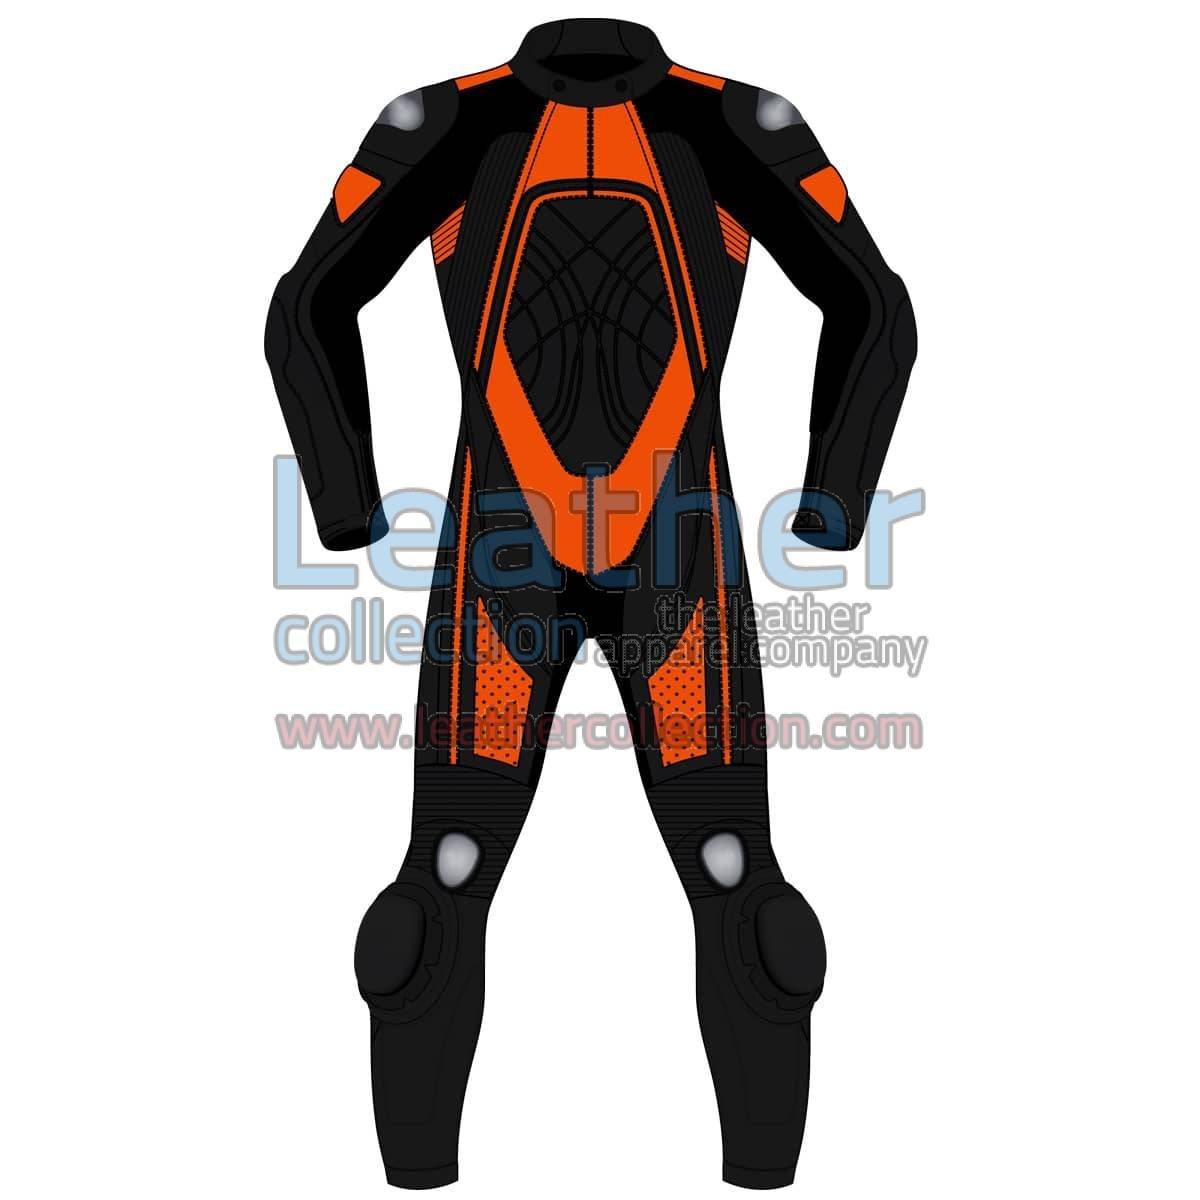 Bi Color One-Piece Motorbike Leather Suit For Men